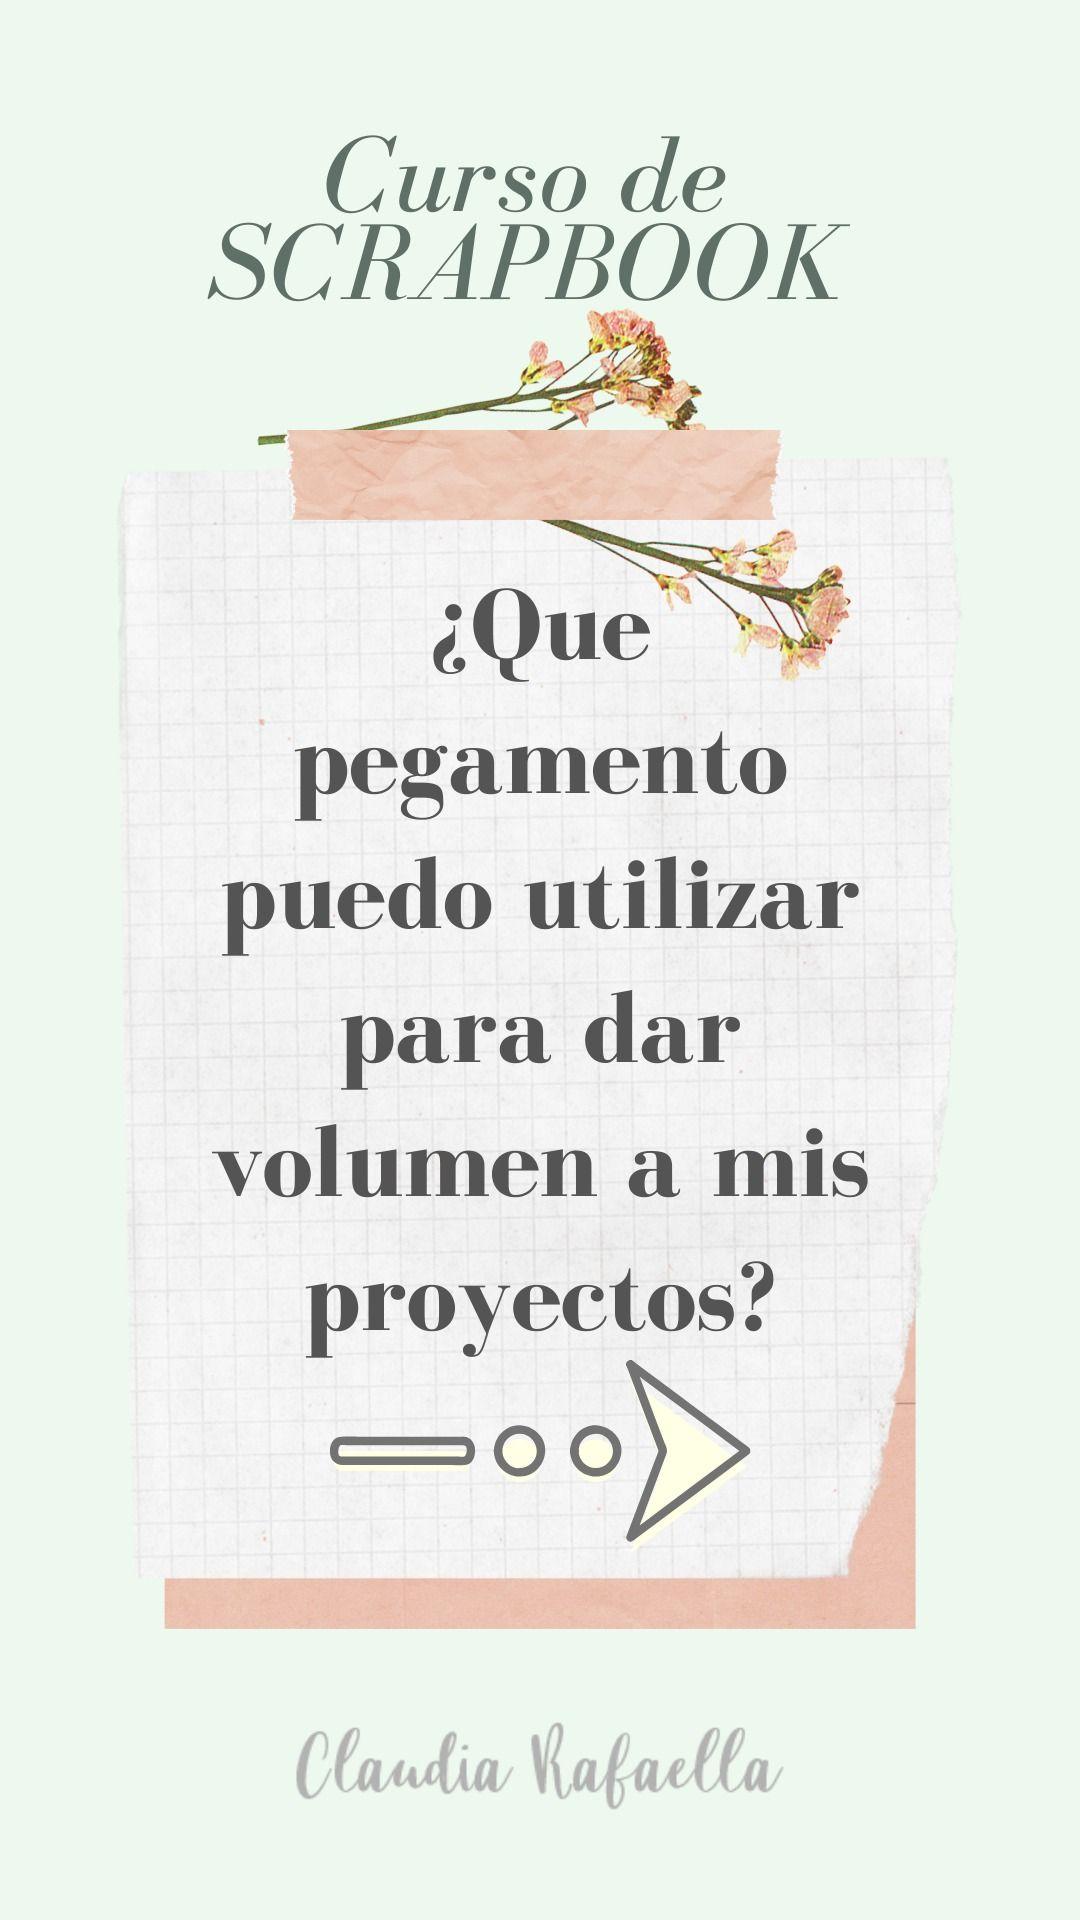 Curso Scrapbook Scrapbook En Espanol Scrapbooking Ideas En 2020 Manualidades Cursillo Pegamento